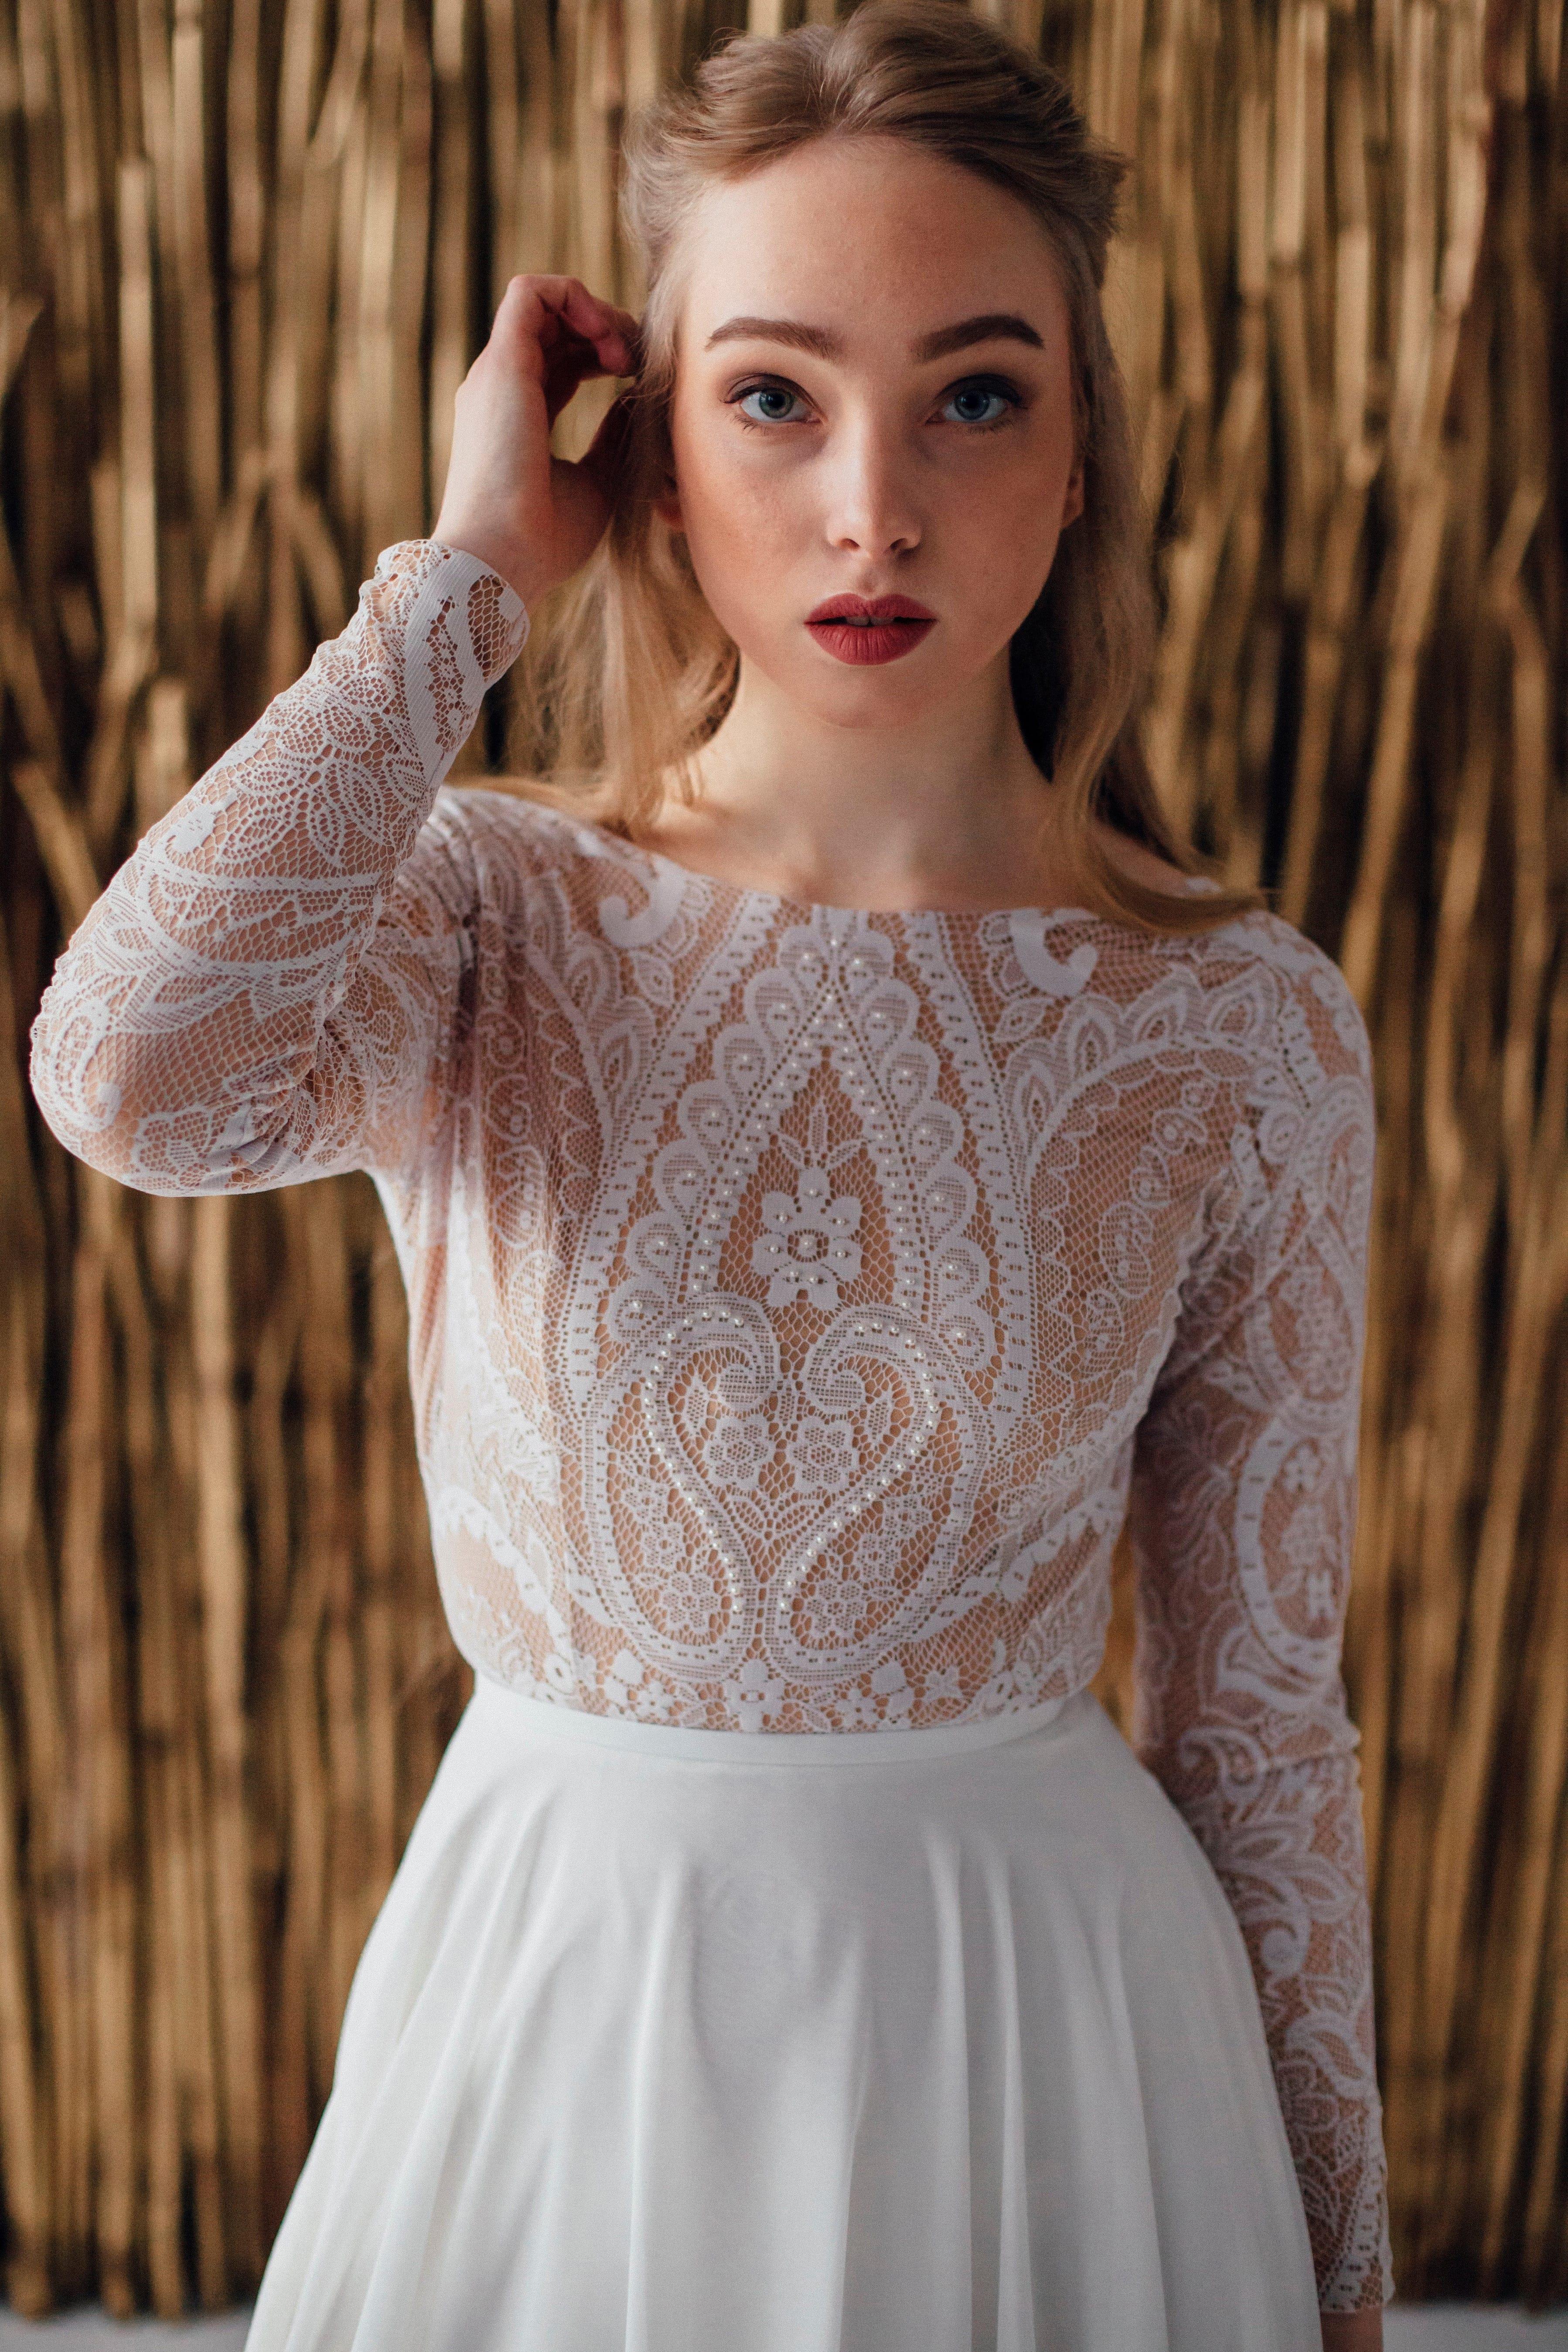 Свадебное платье GILL, коллекция MAGIC OF TENDERNESS, бренд LORA SONG, фото 2